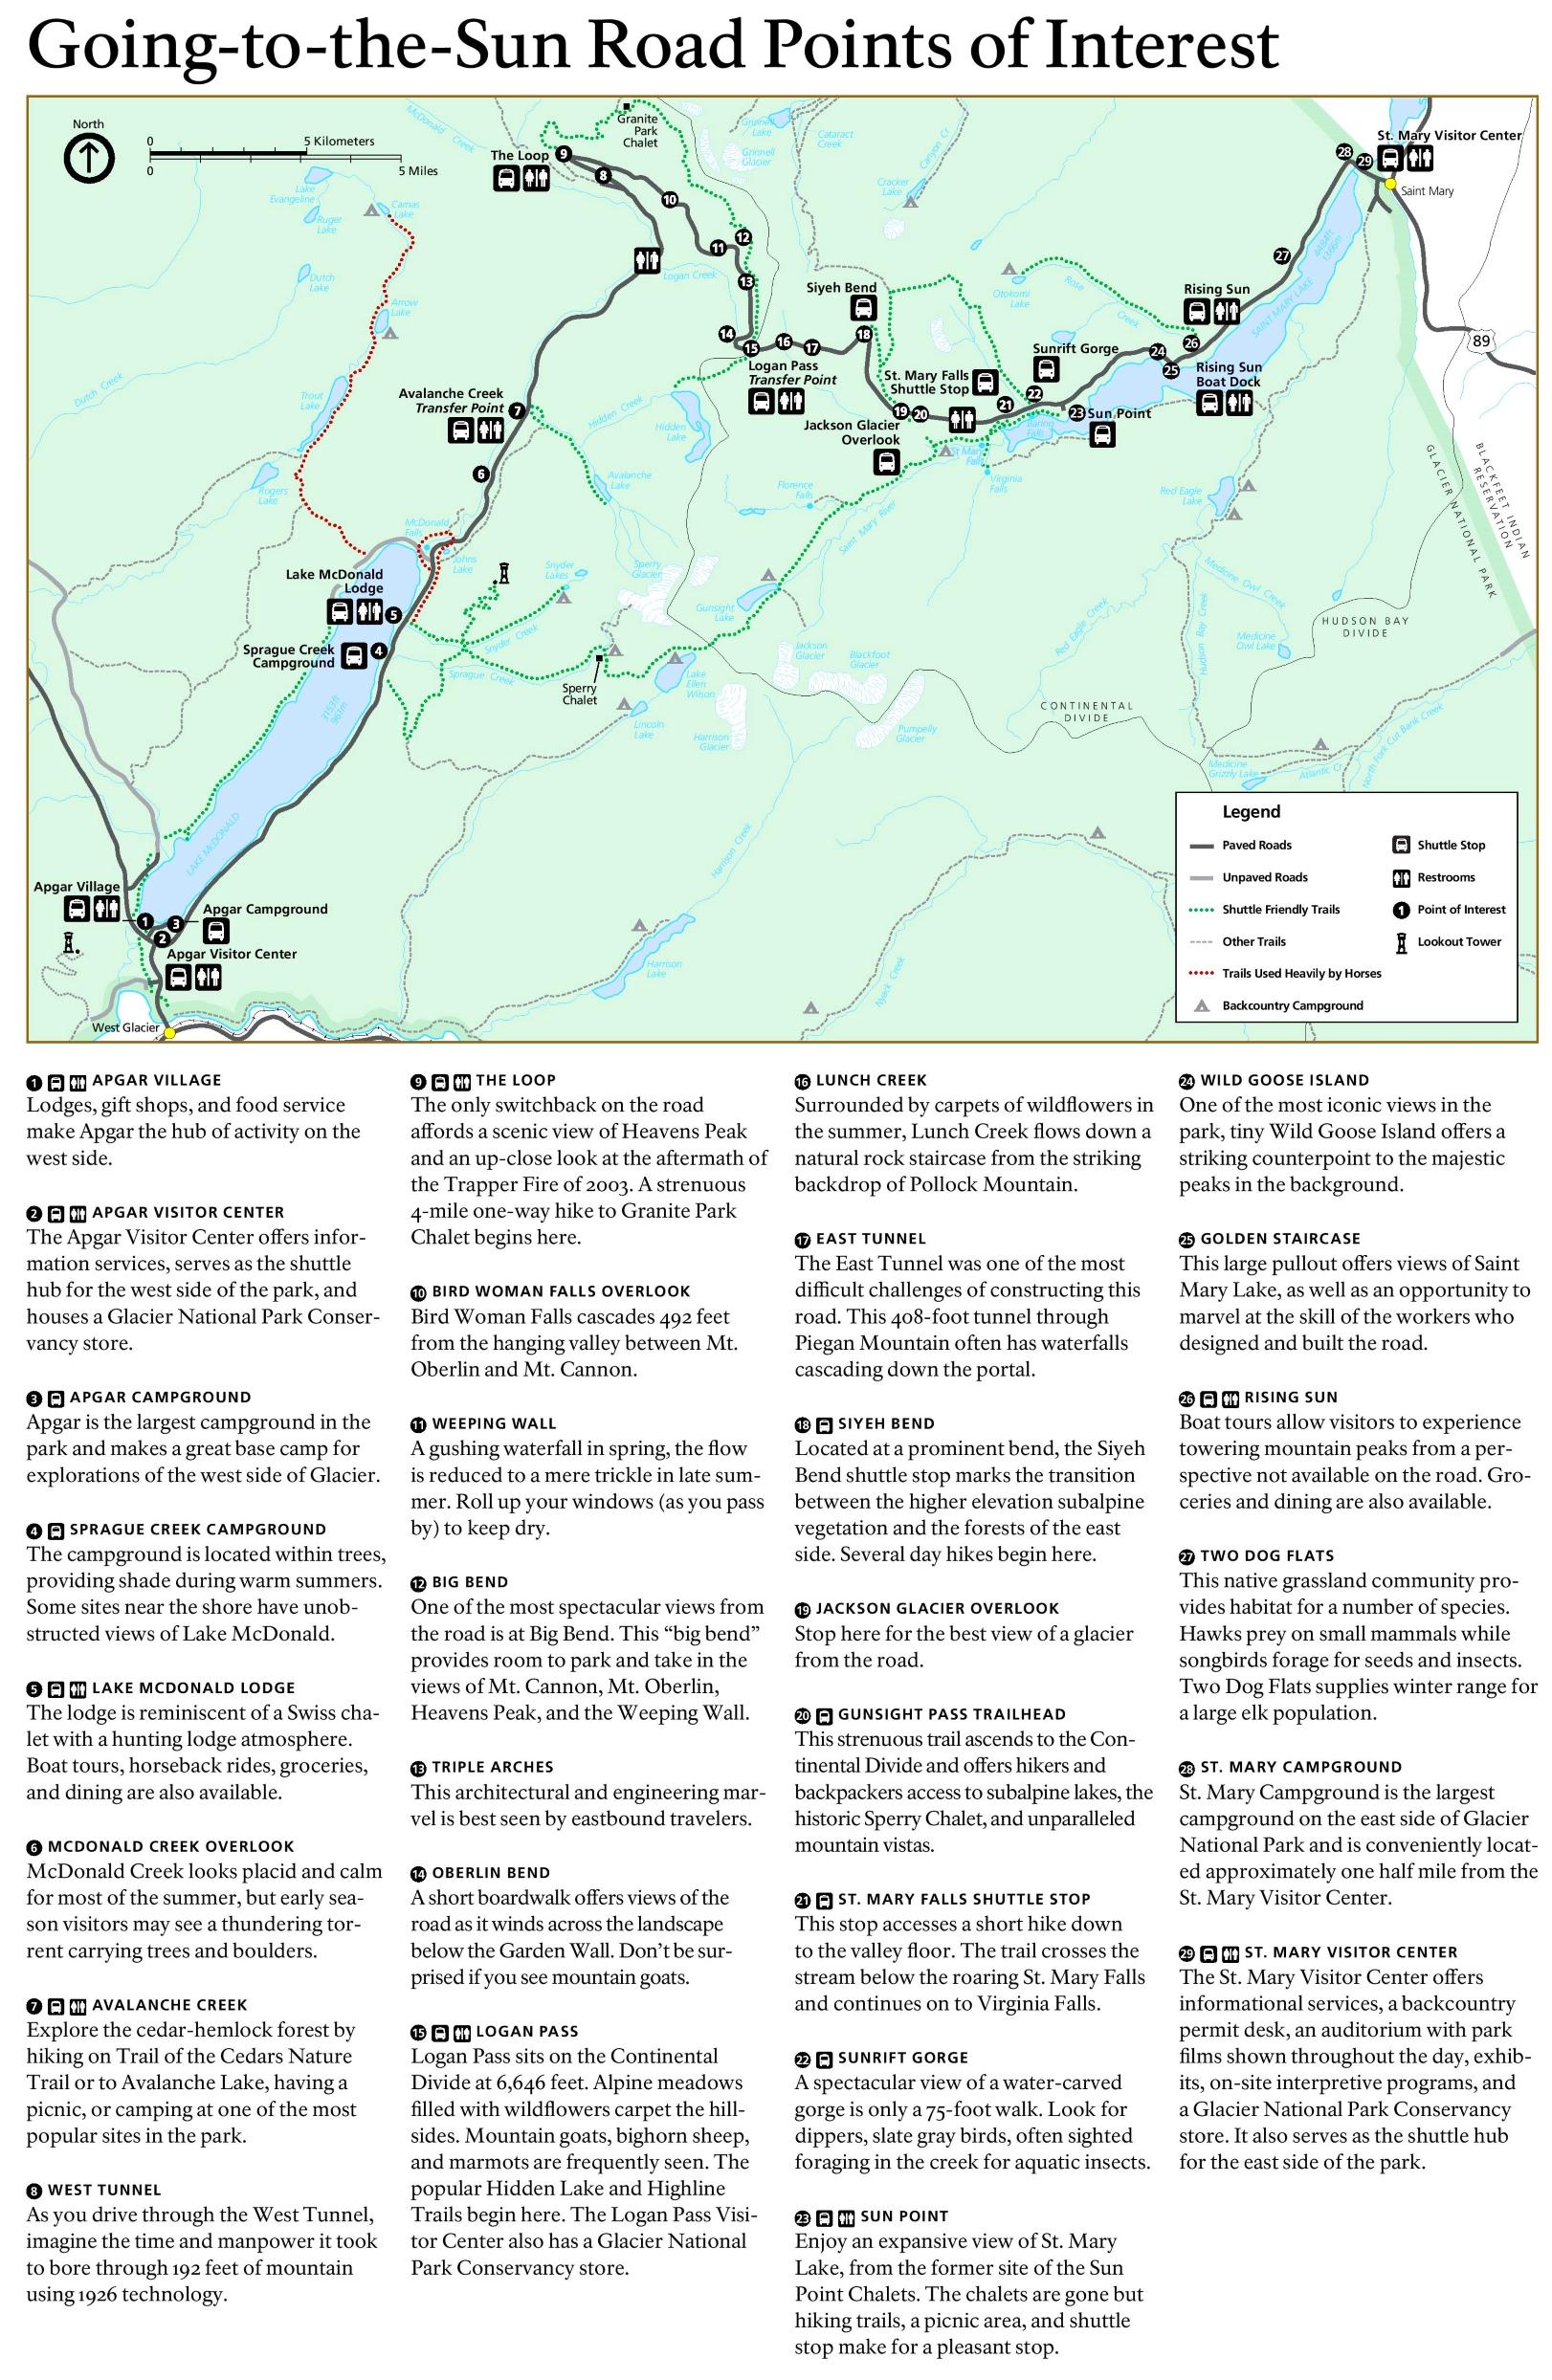 GoingtotheSun Road sightseeing map